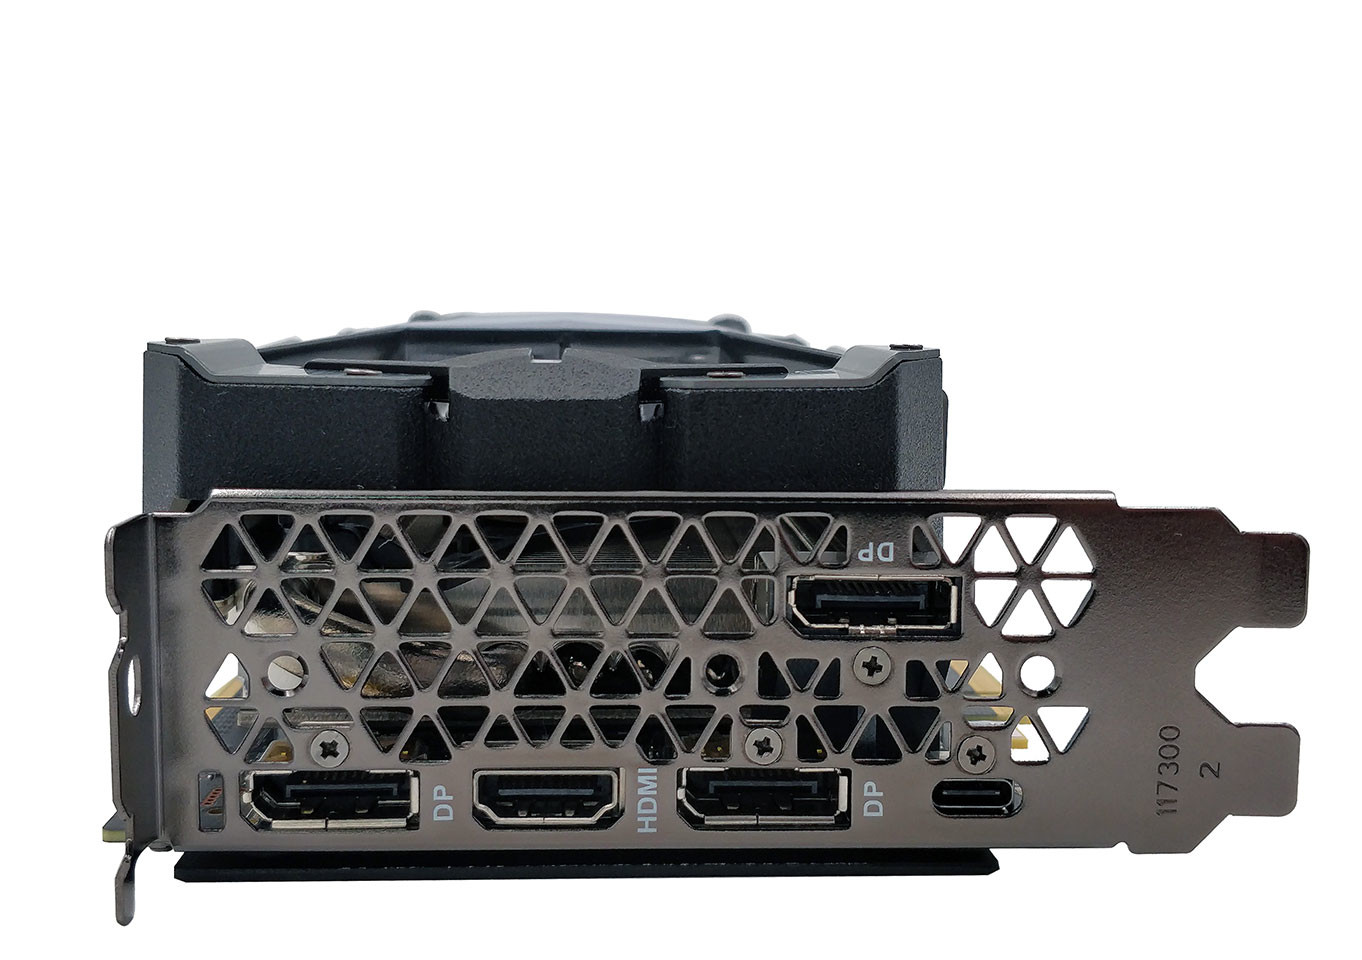 Manli GeForce RTX 2080 Ti Gallarado